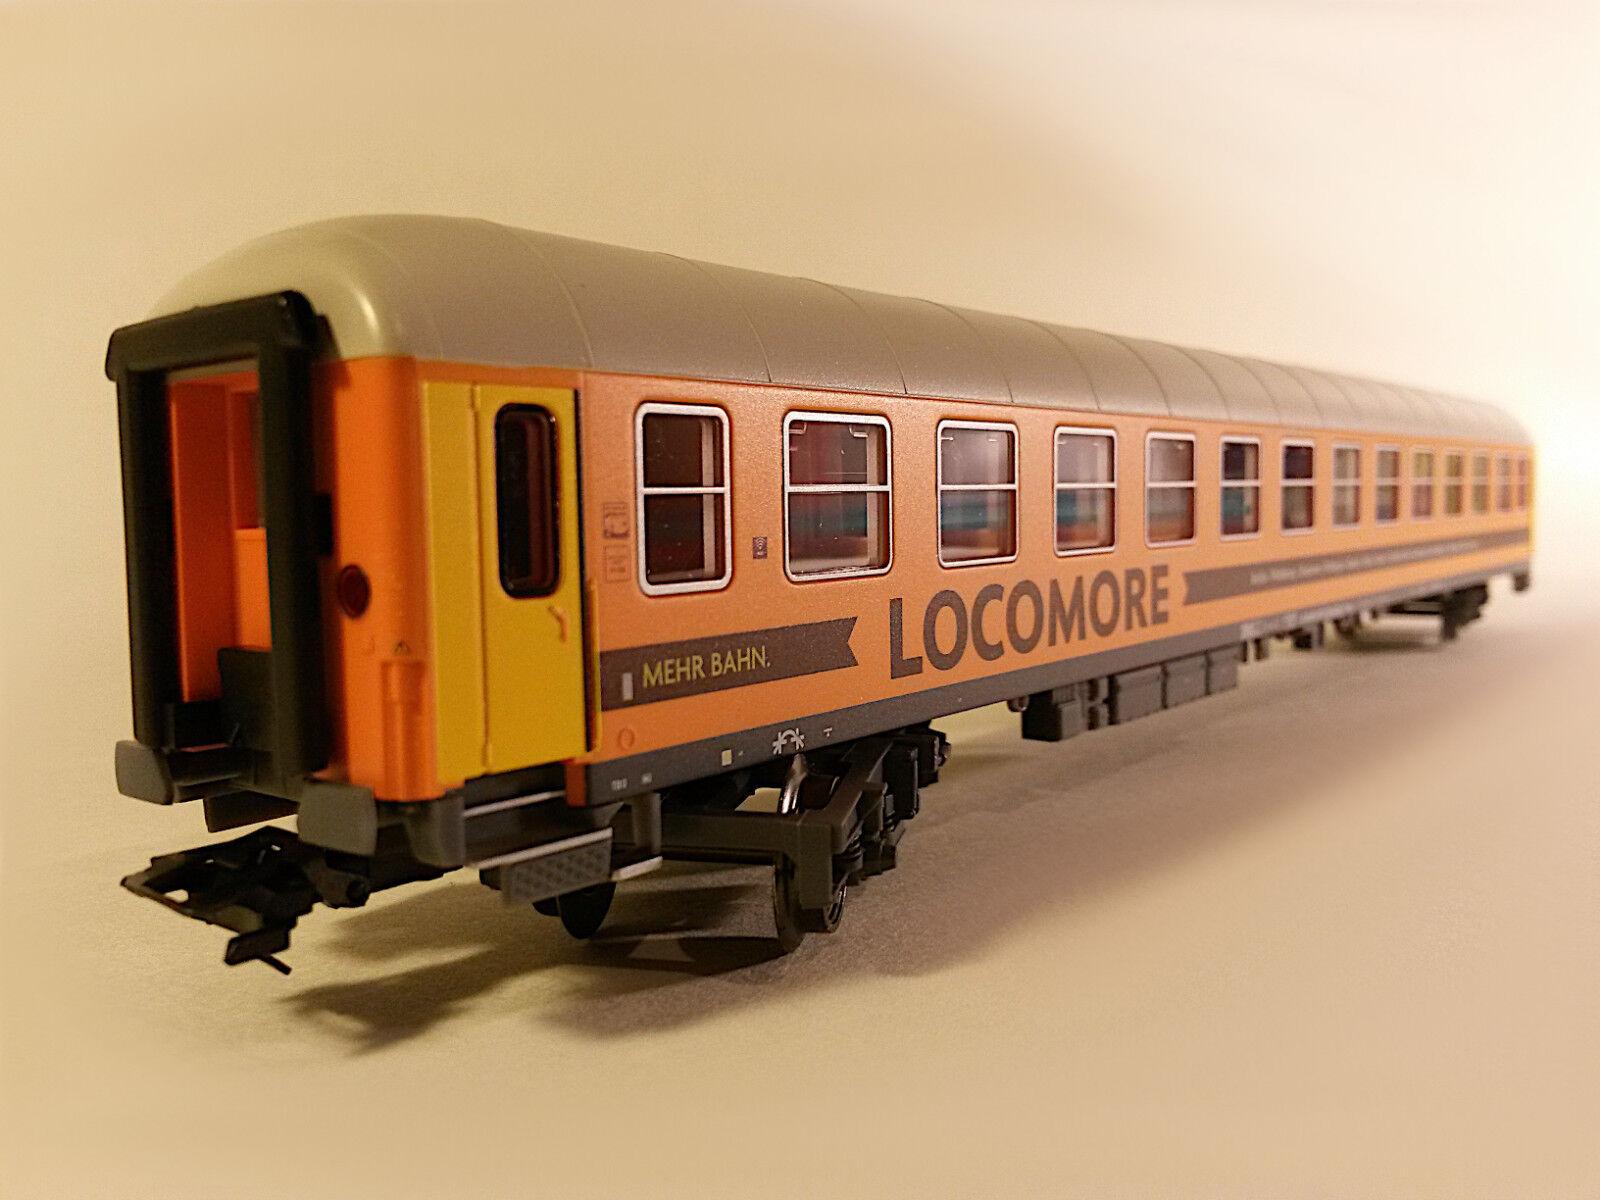 Locomore 002-1 - Märklin HO Wagen 43920.001 43920.001 43920.001  LOC-Beutel  | Mittlere Kosten  5c4c2b